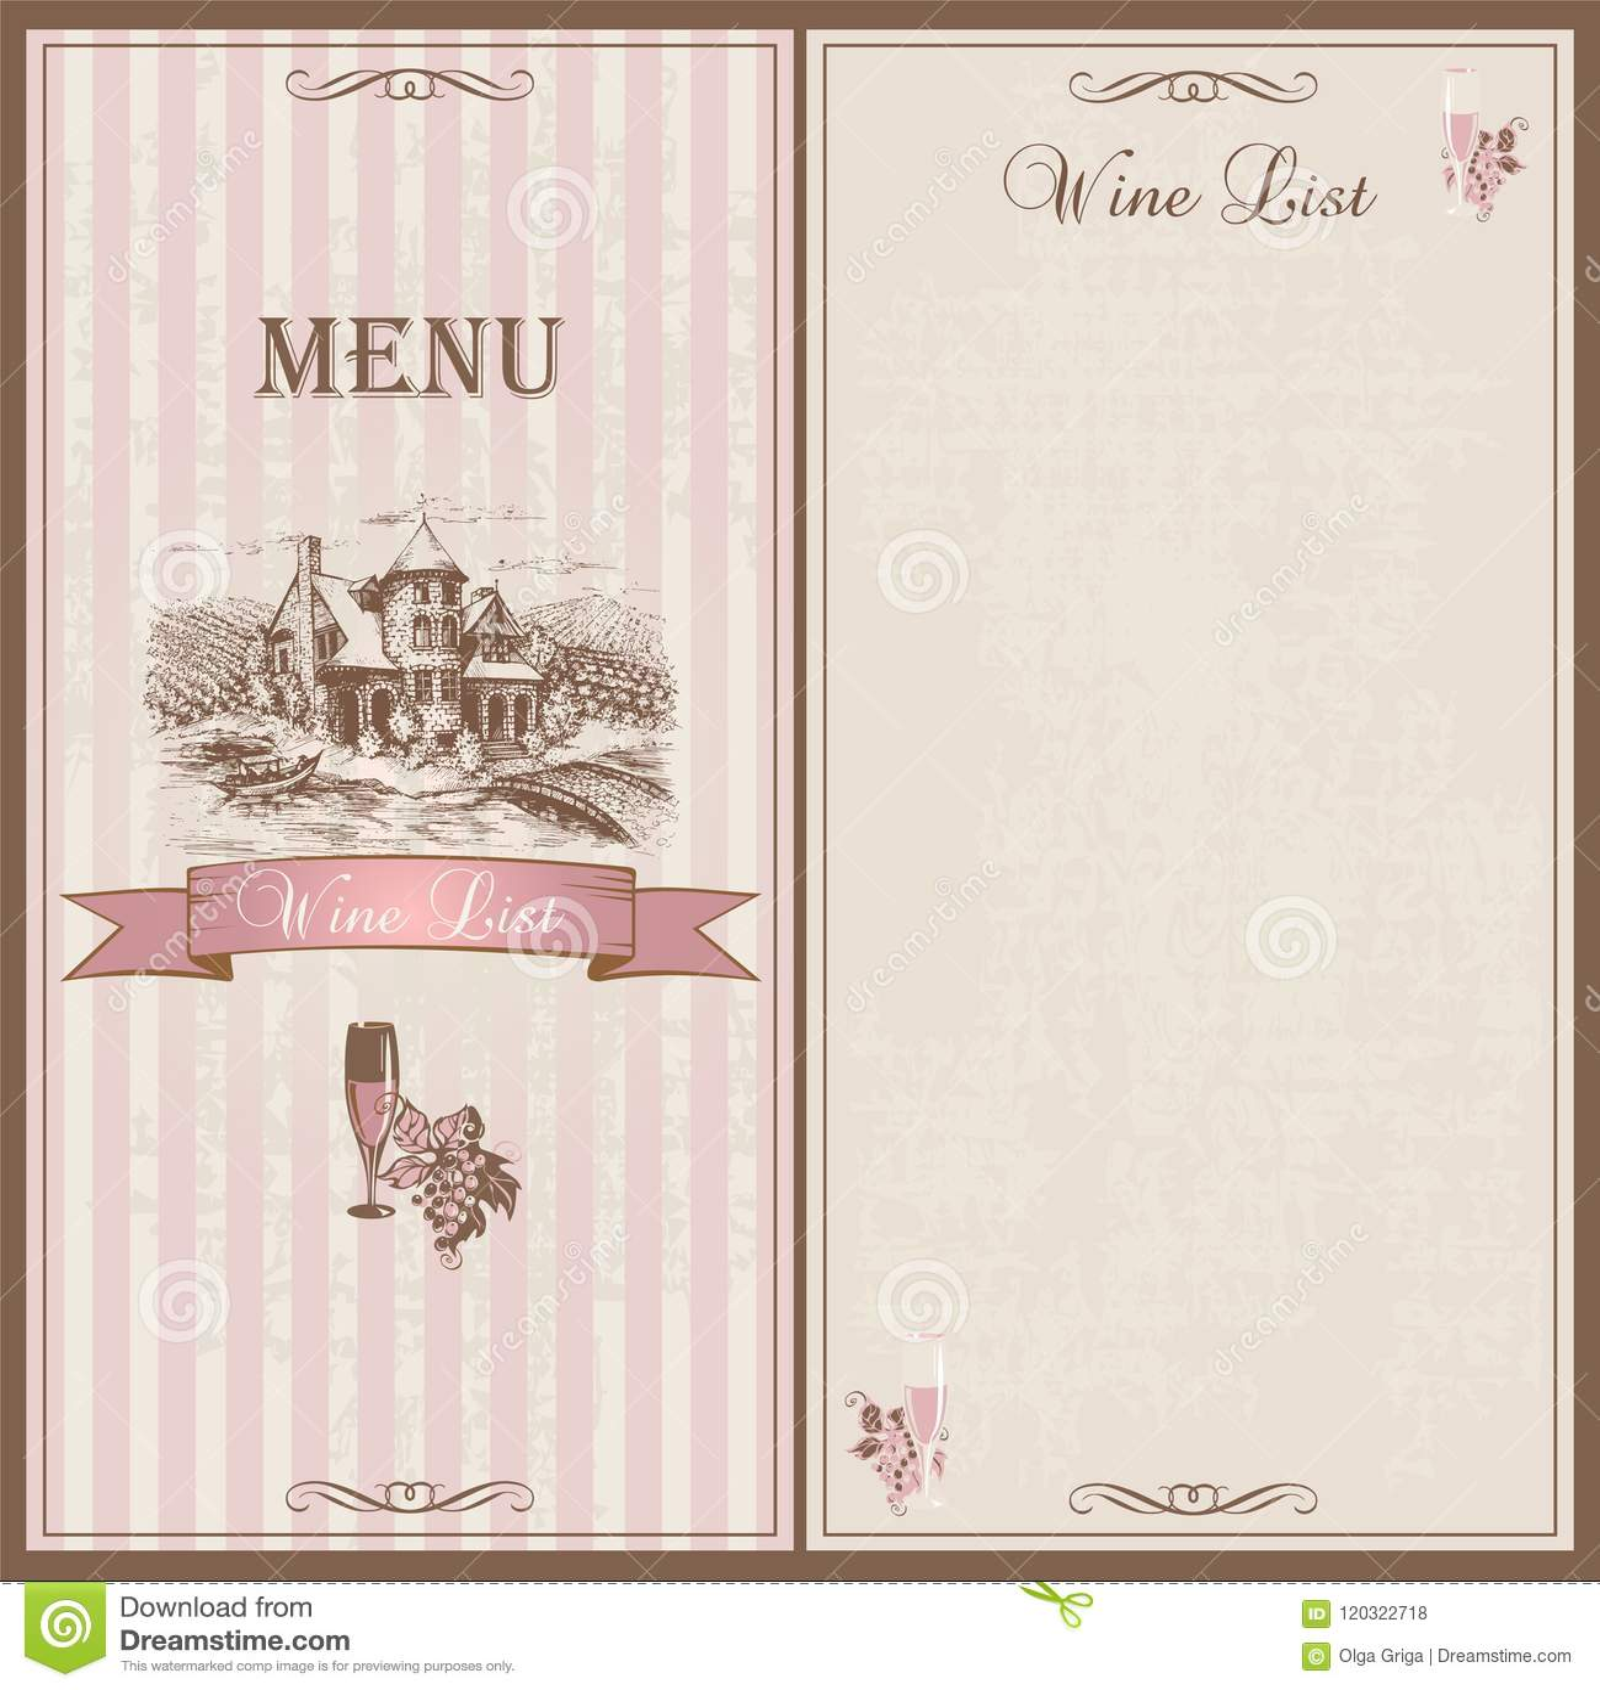 wine menu wine list template design for restaurants sketch of the